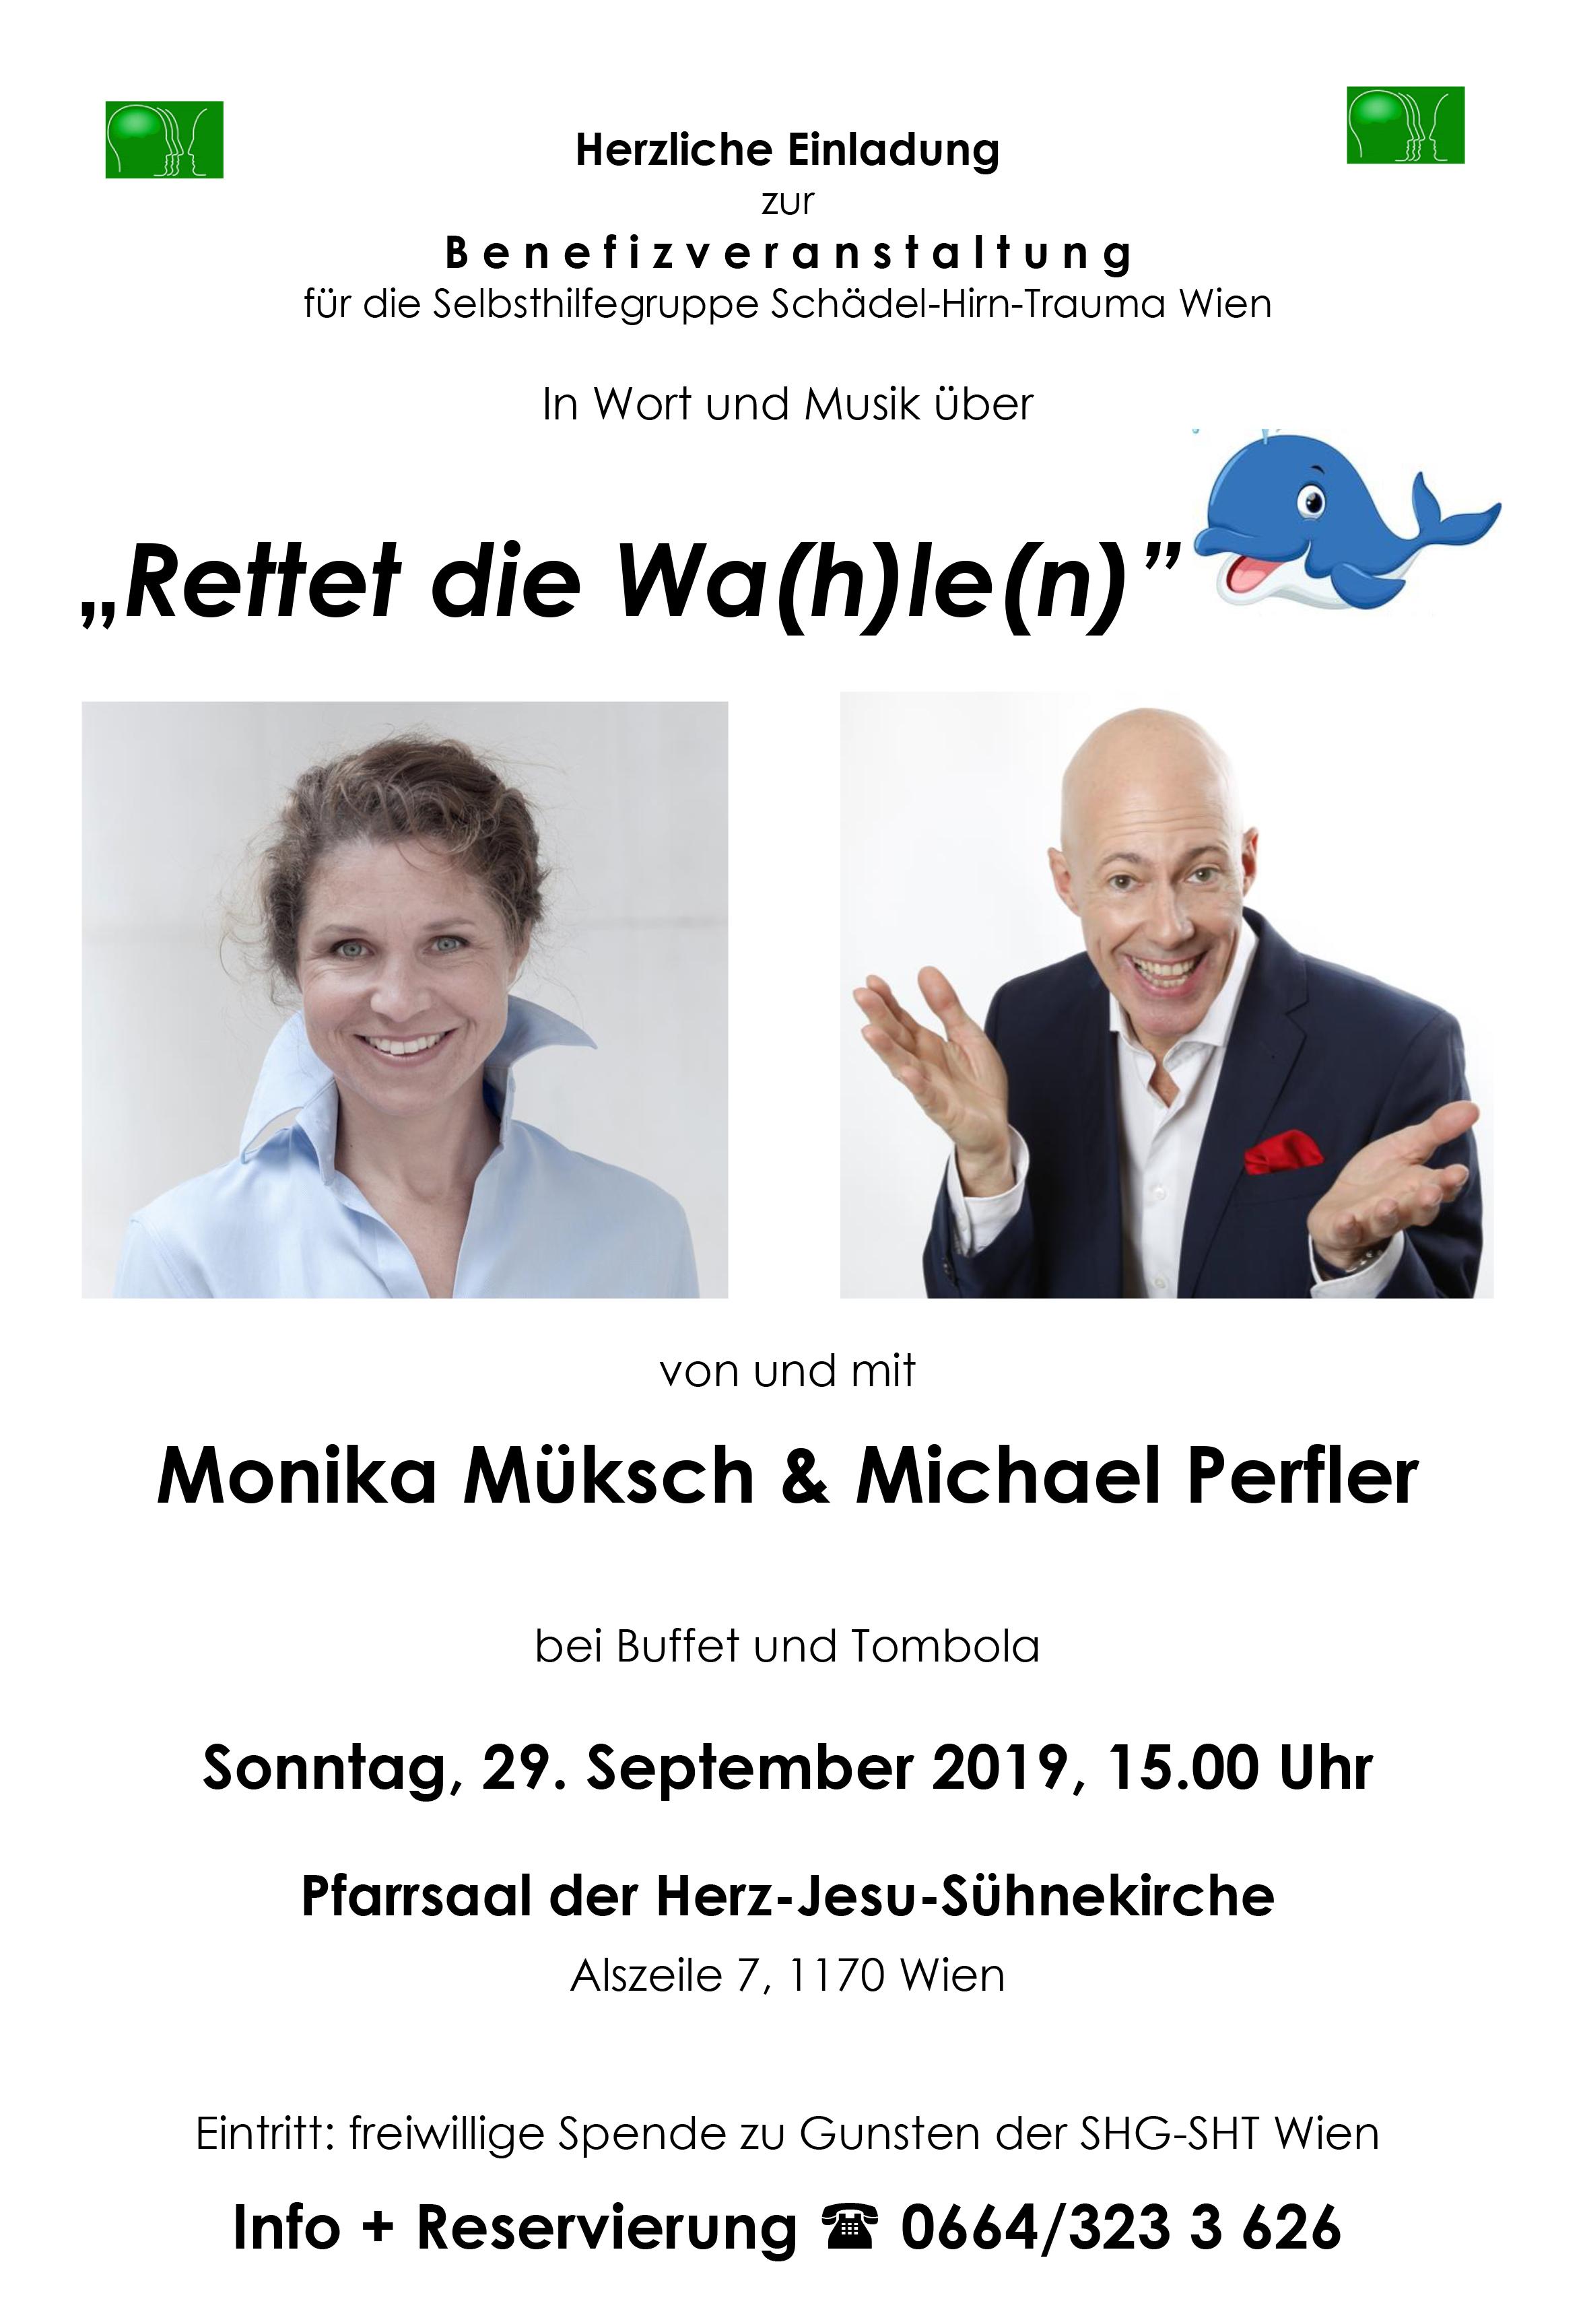 2019-09 Benefiz Rettet die Wa(h)le(n)